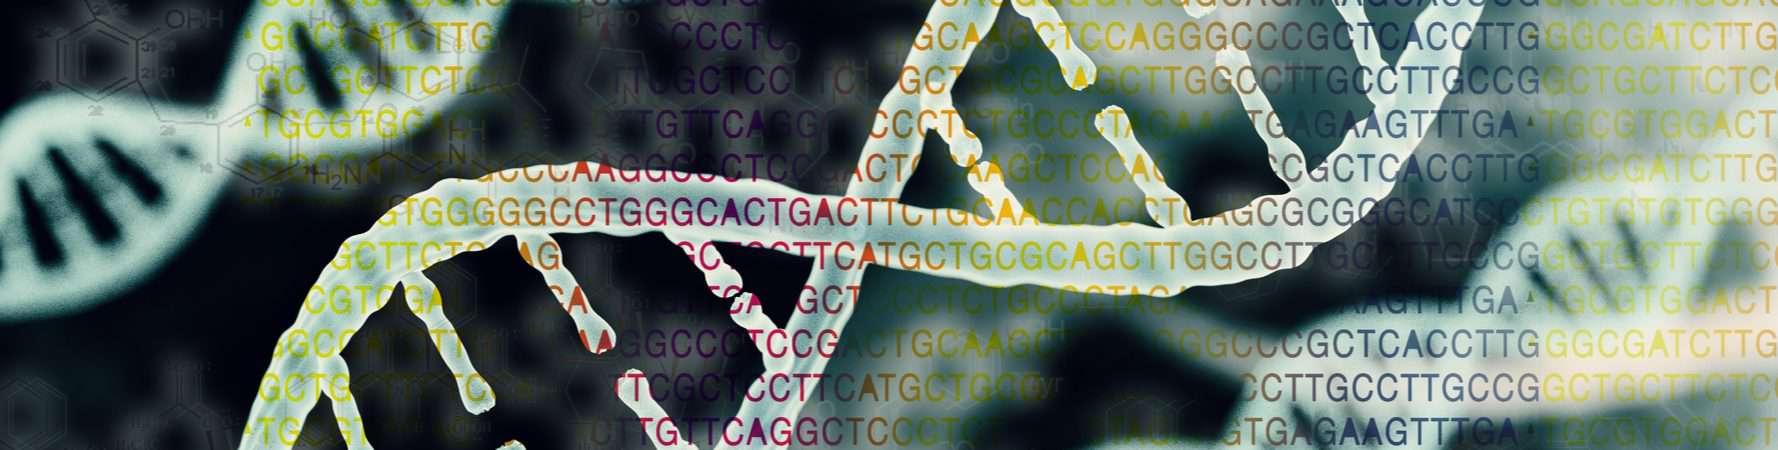 Cadeias de DNA sendo sequenciadas